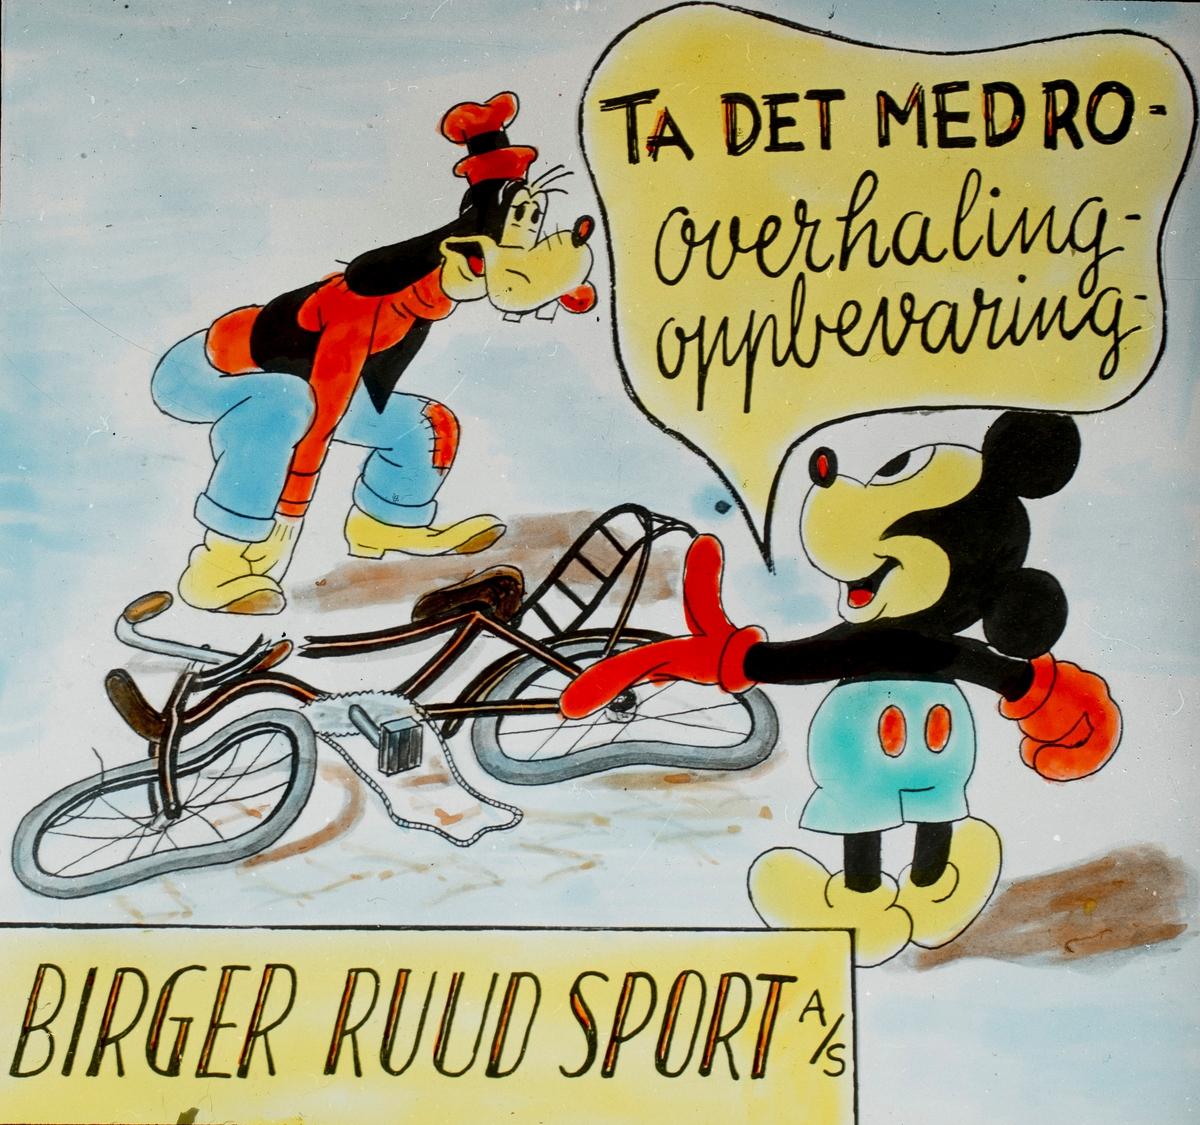 Slides promoting Birger Ruud's sports shop